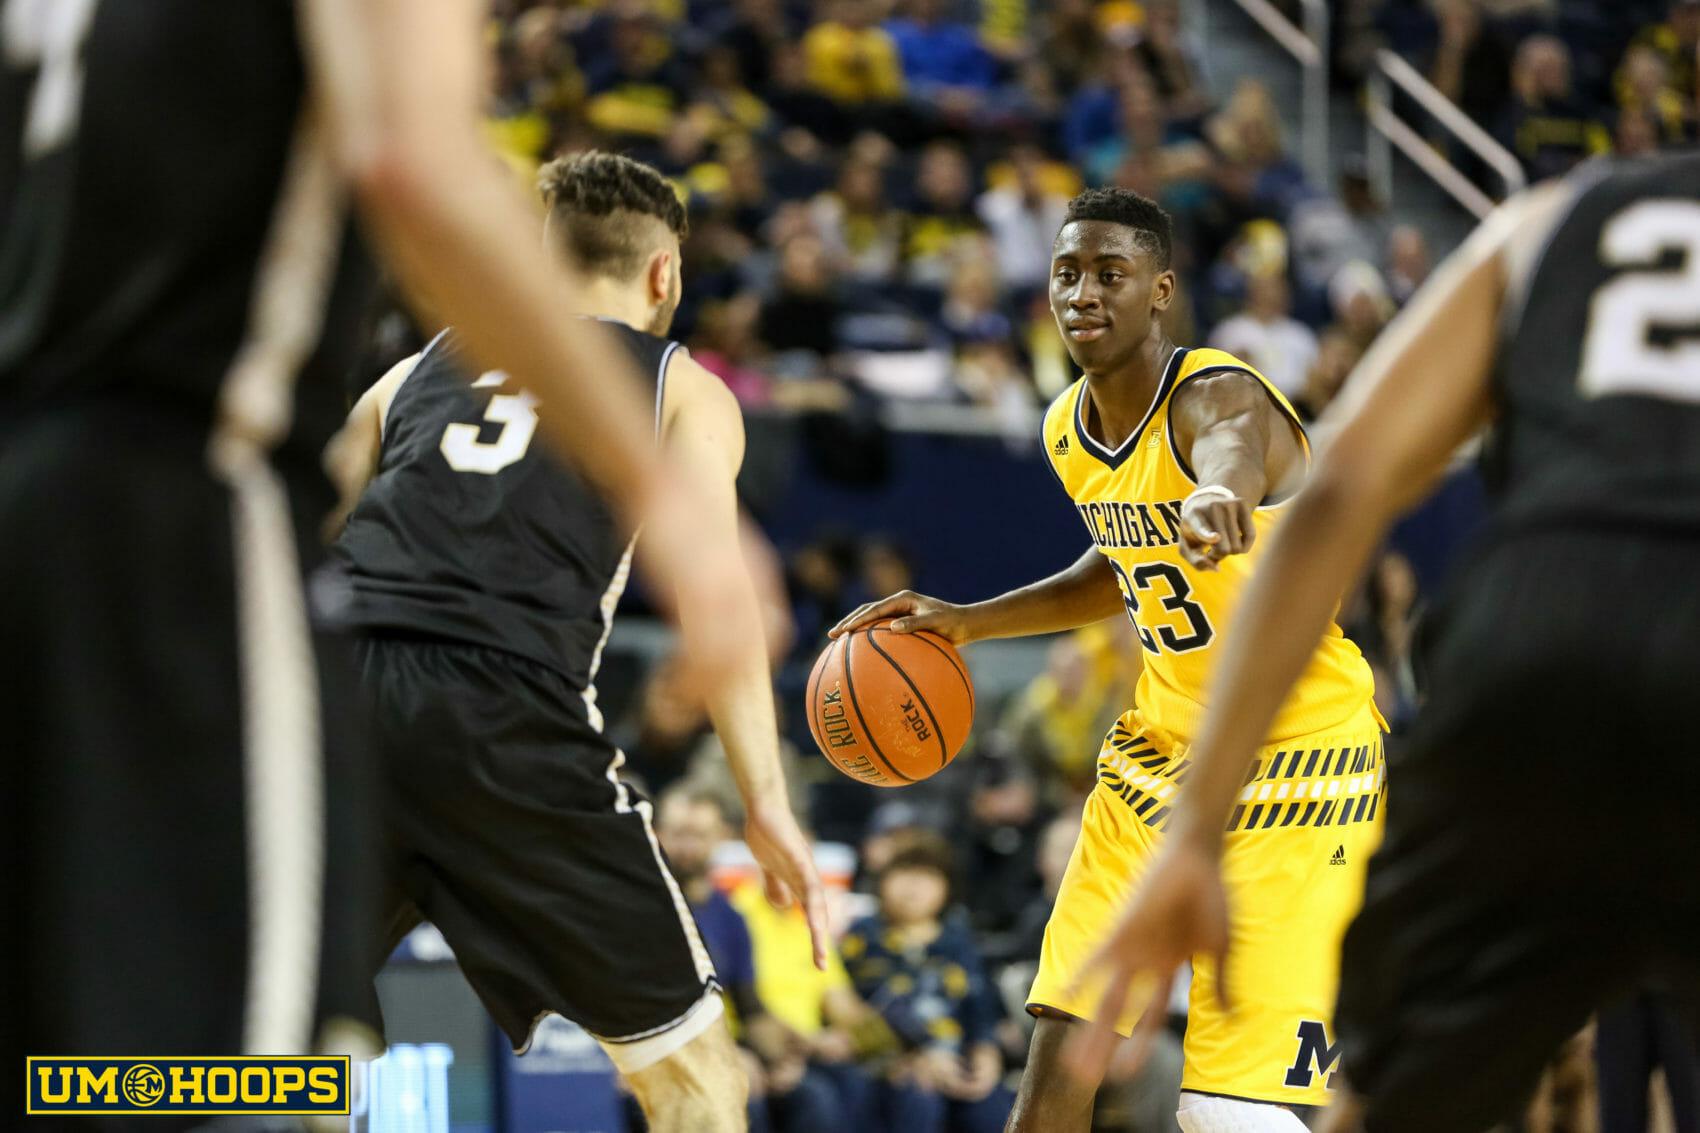 Michigan 96, Bryant 60-22